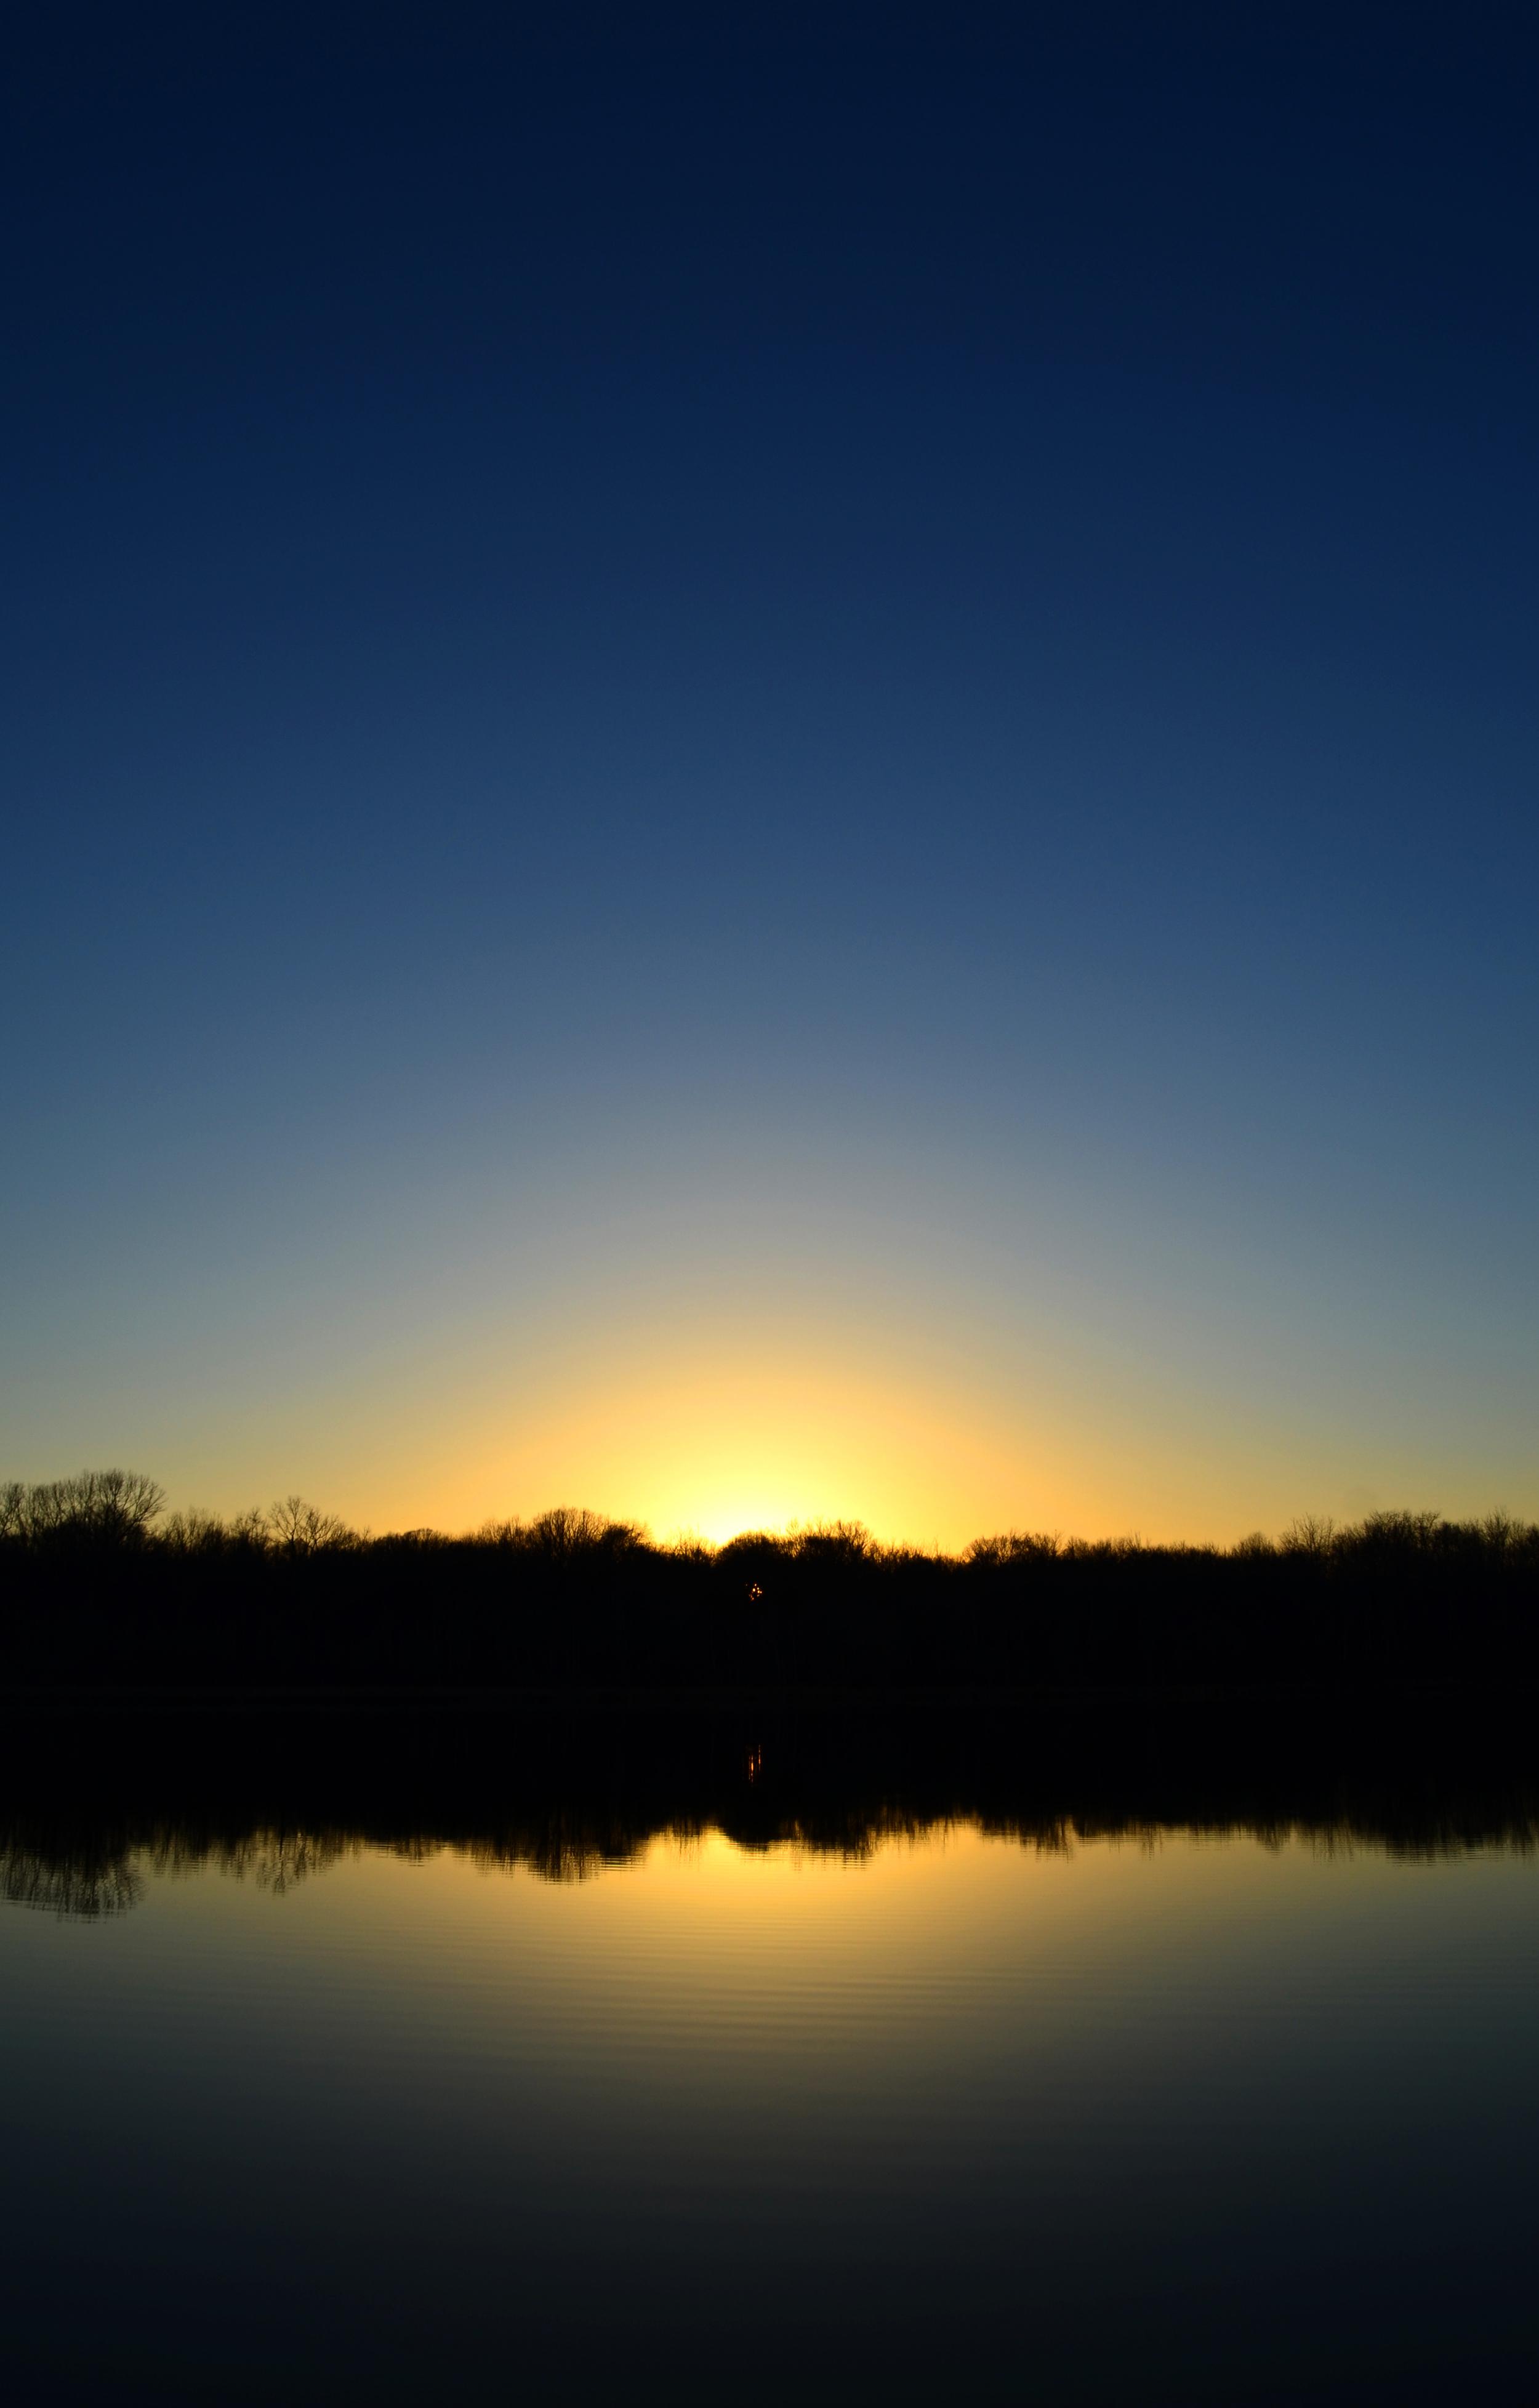 Sunset at Pigeon Swamp - South Brunswick, NJ